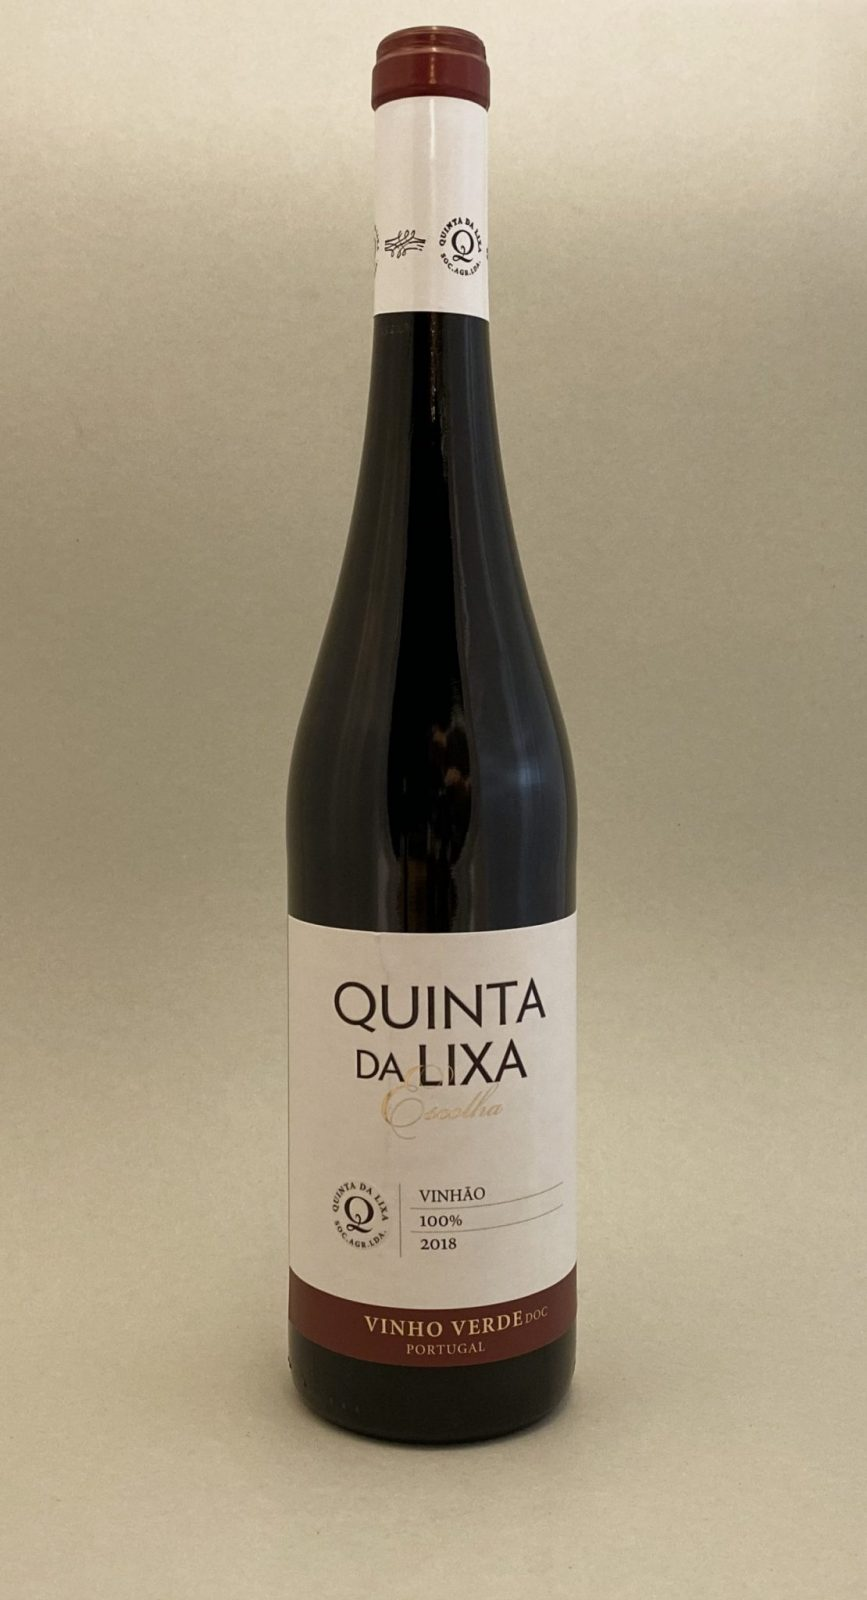 QUINTA DA LIXA Escoltha 2018, vinoteka Sunny wines slnecnice Bratislava mesto, petrzalka, vino červené z Portugalska